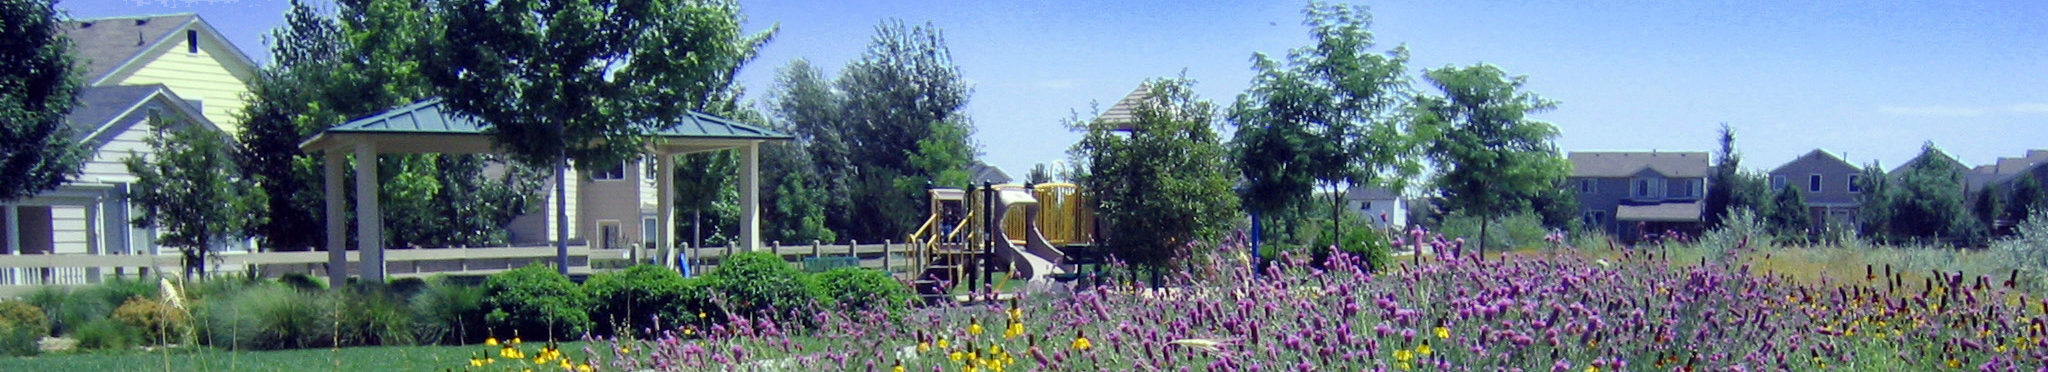 Erie Neighborhood Park